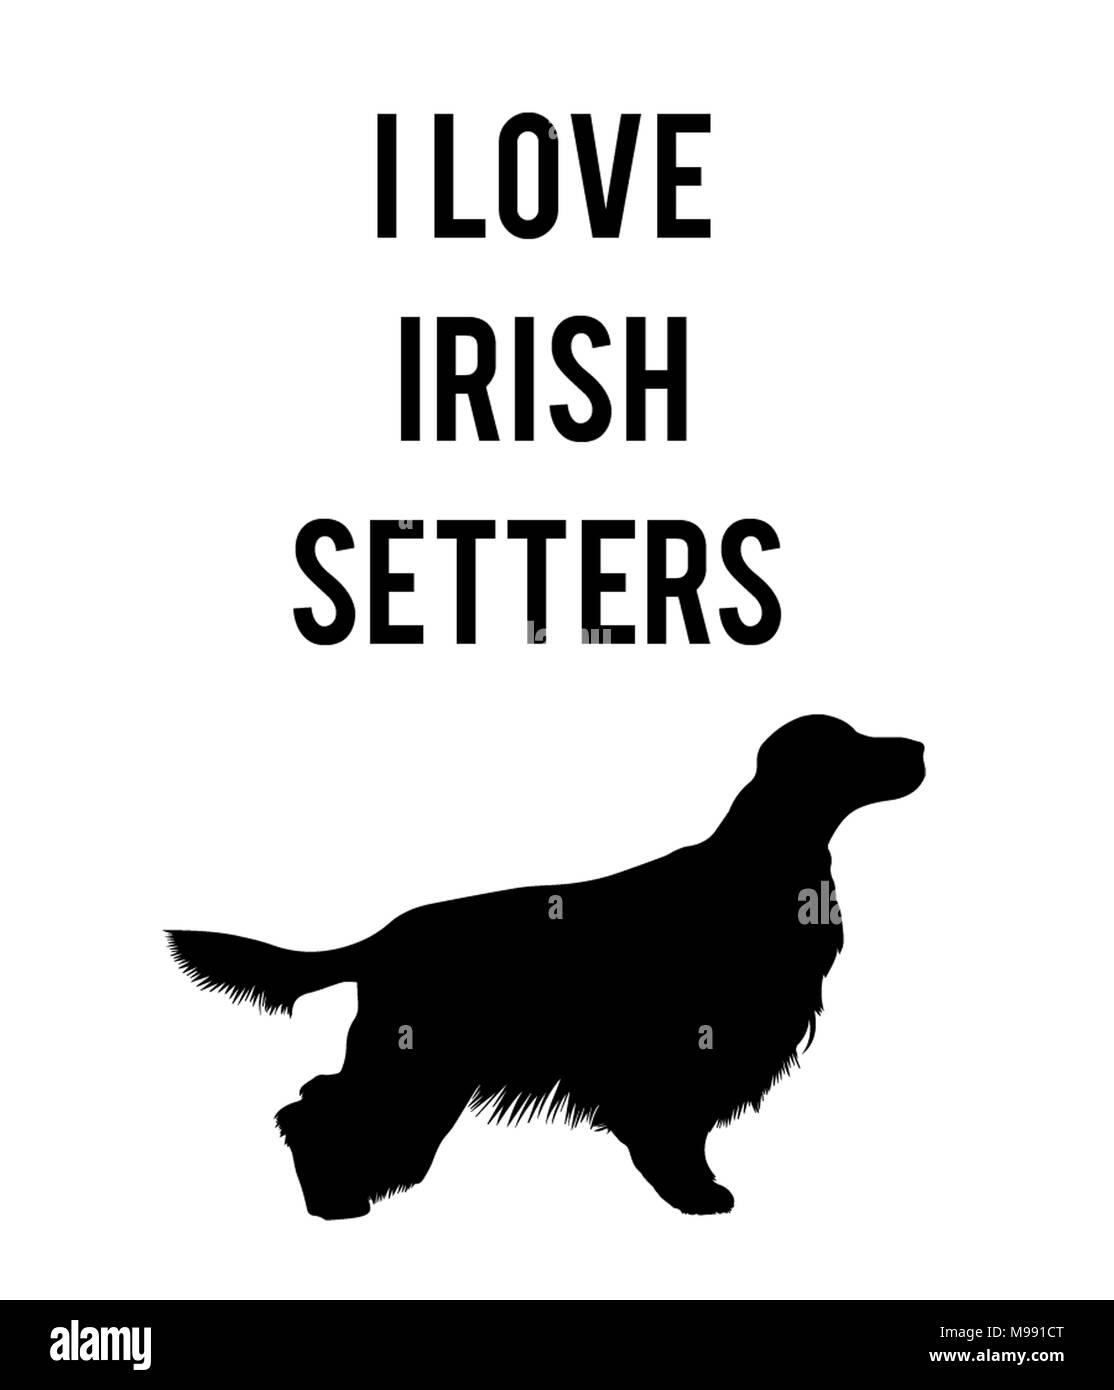 I love Irish Setters - Stock Image